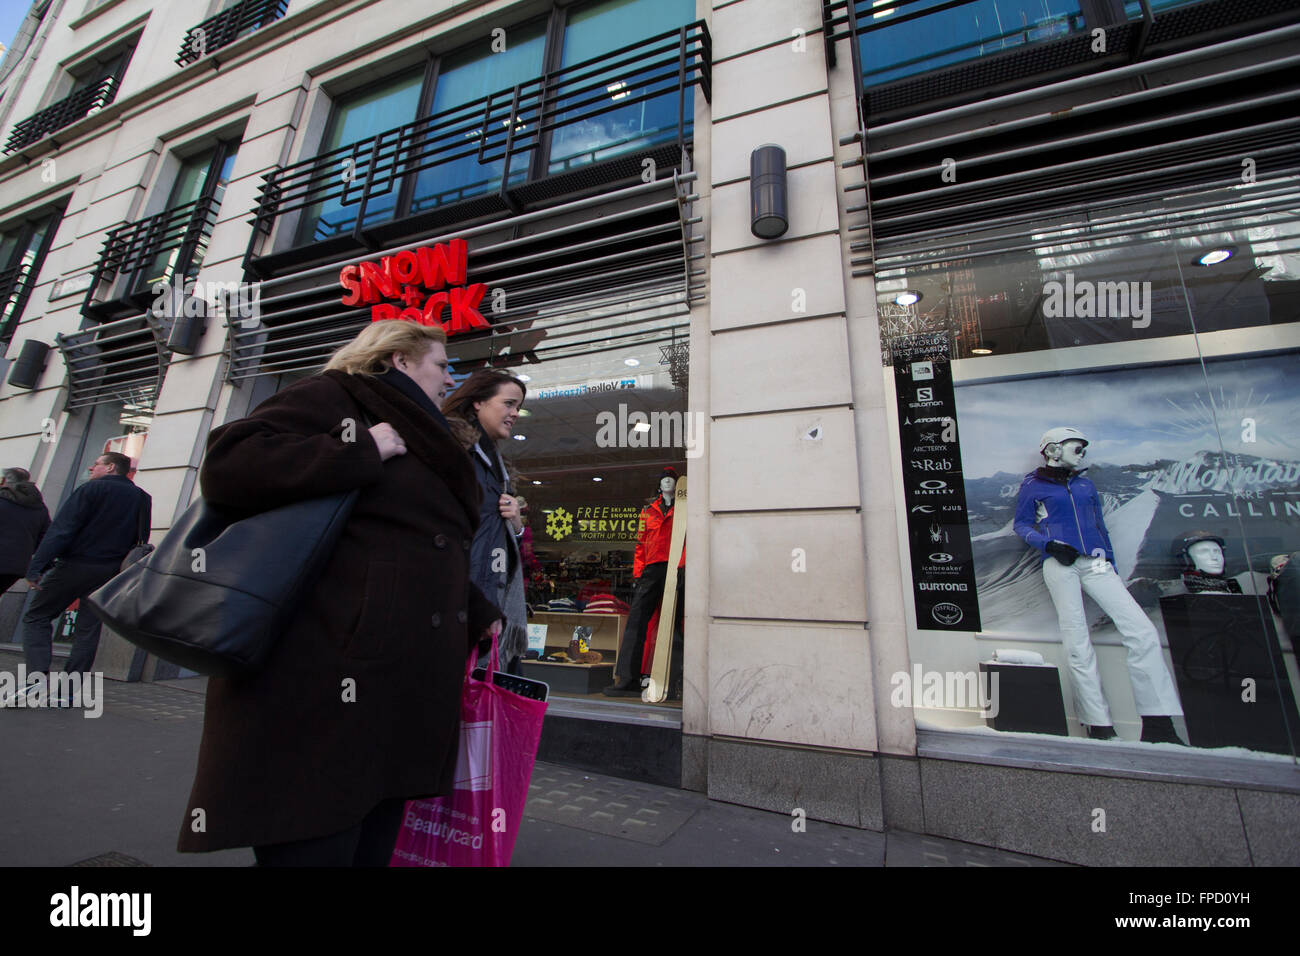 Schnee und Fels Outdoorsport retail Outlet, London, UK Stockbild